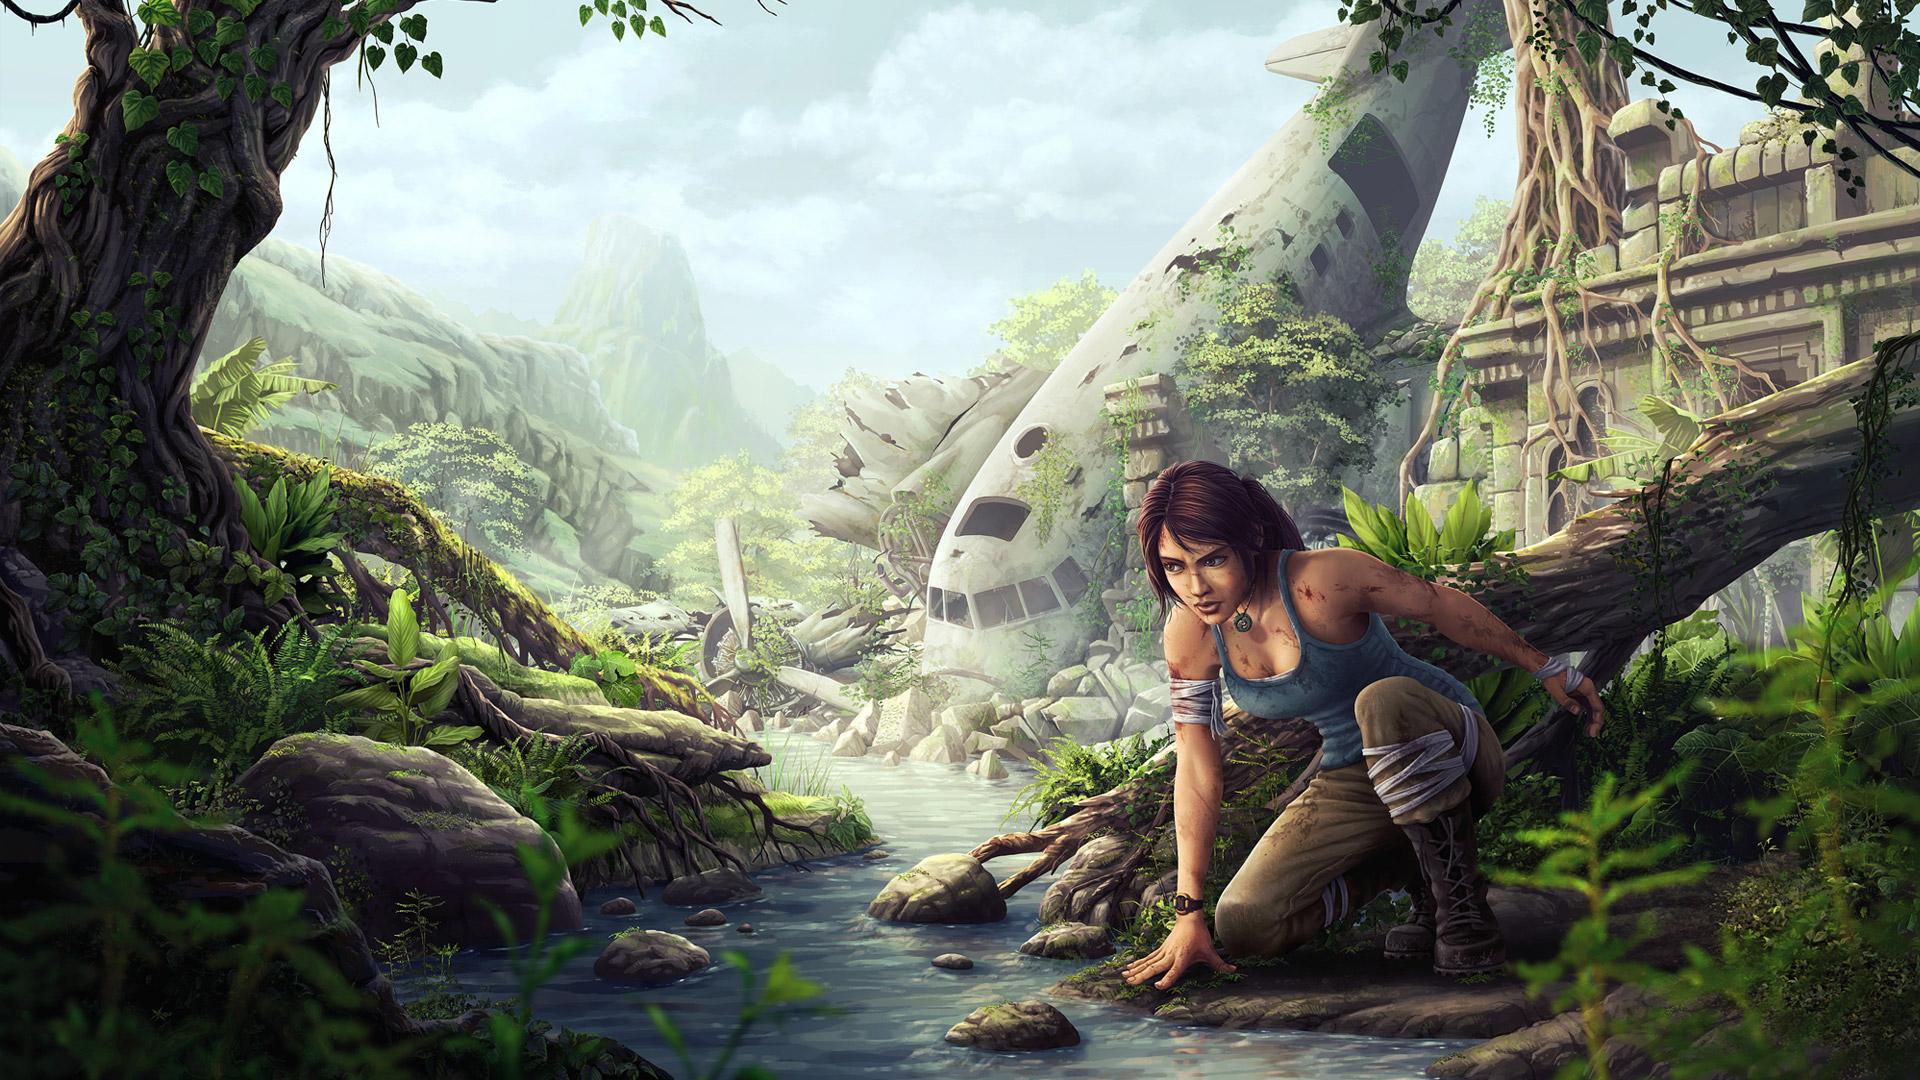 Tomb Raider wallpaper 8